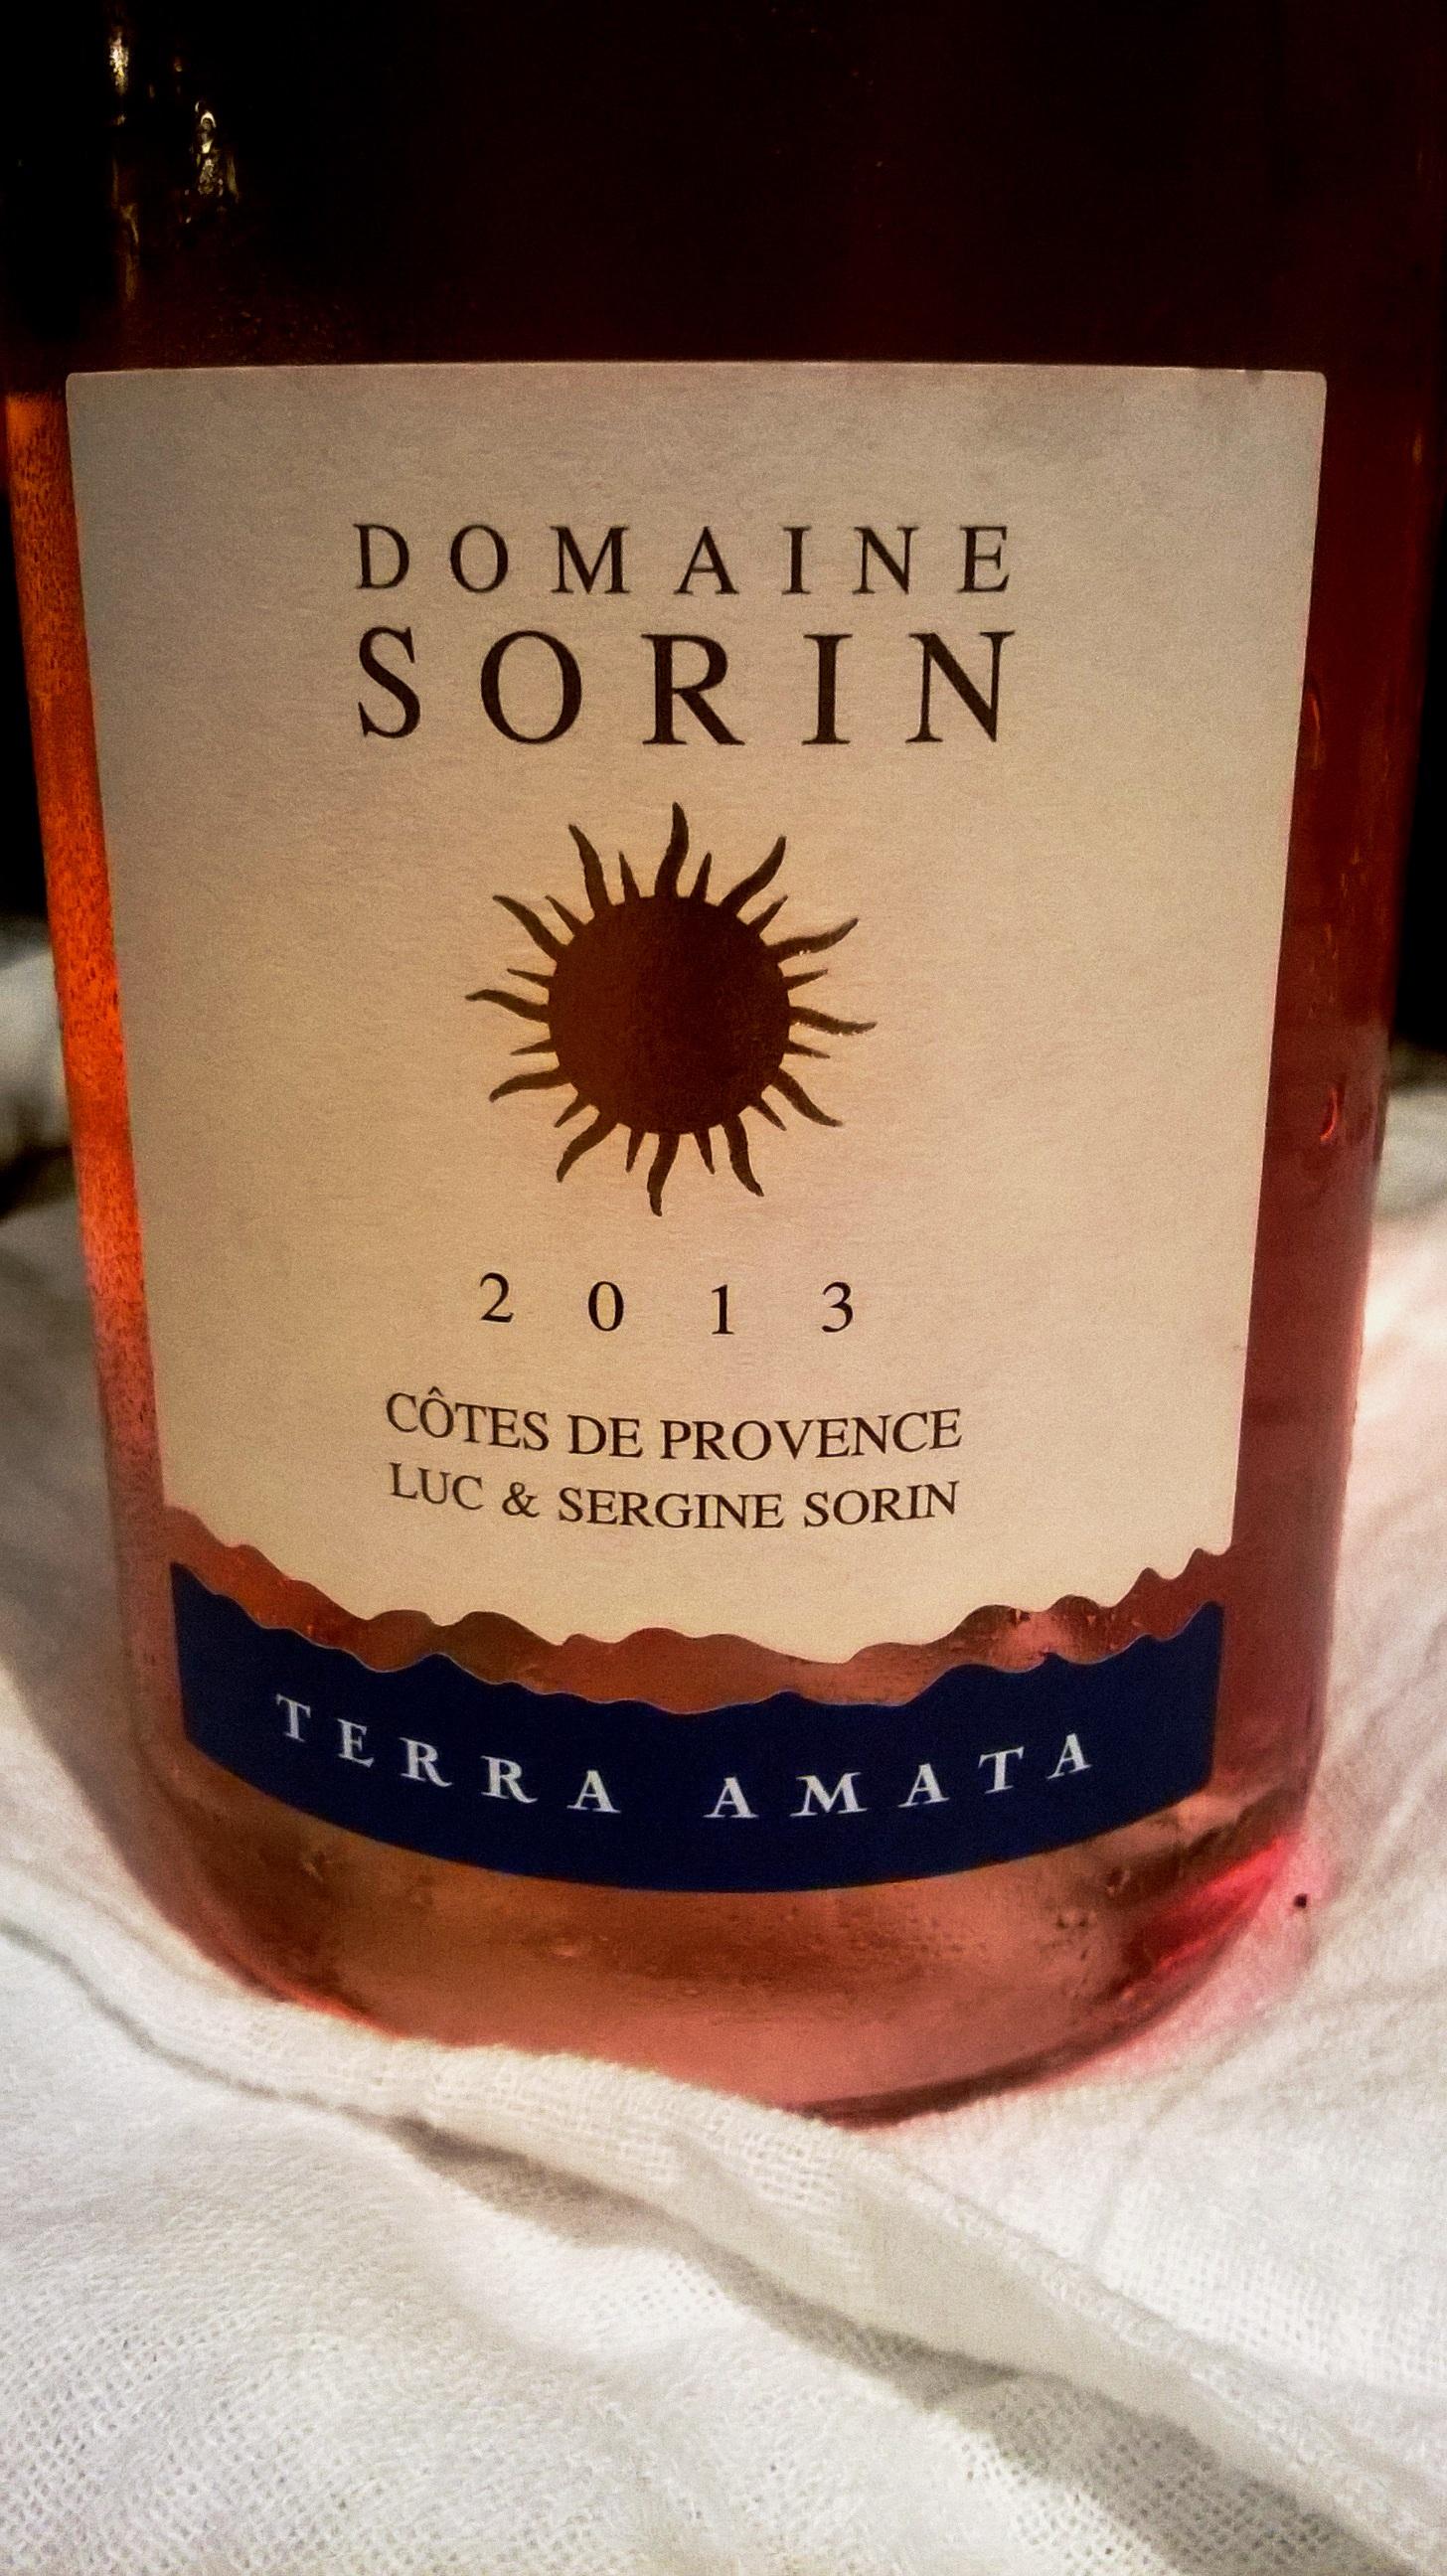 Domaine Sorin Cotes De Provence Rose 2013